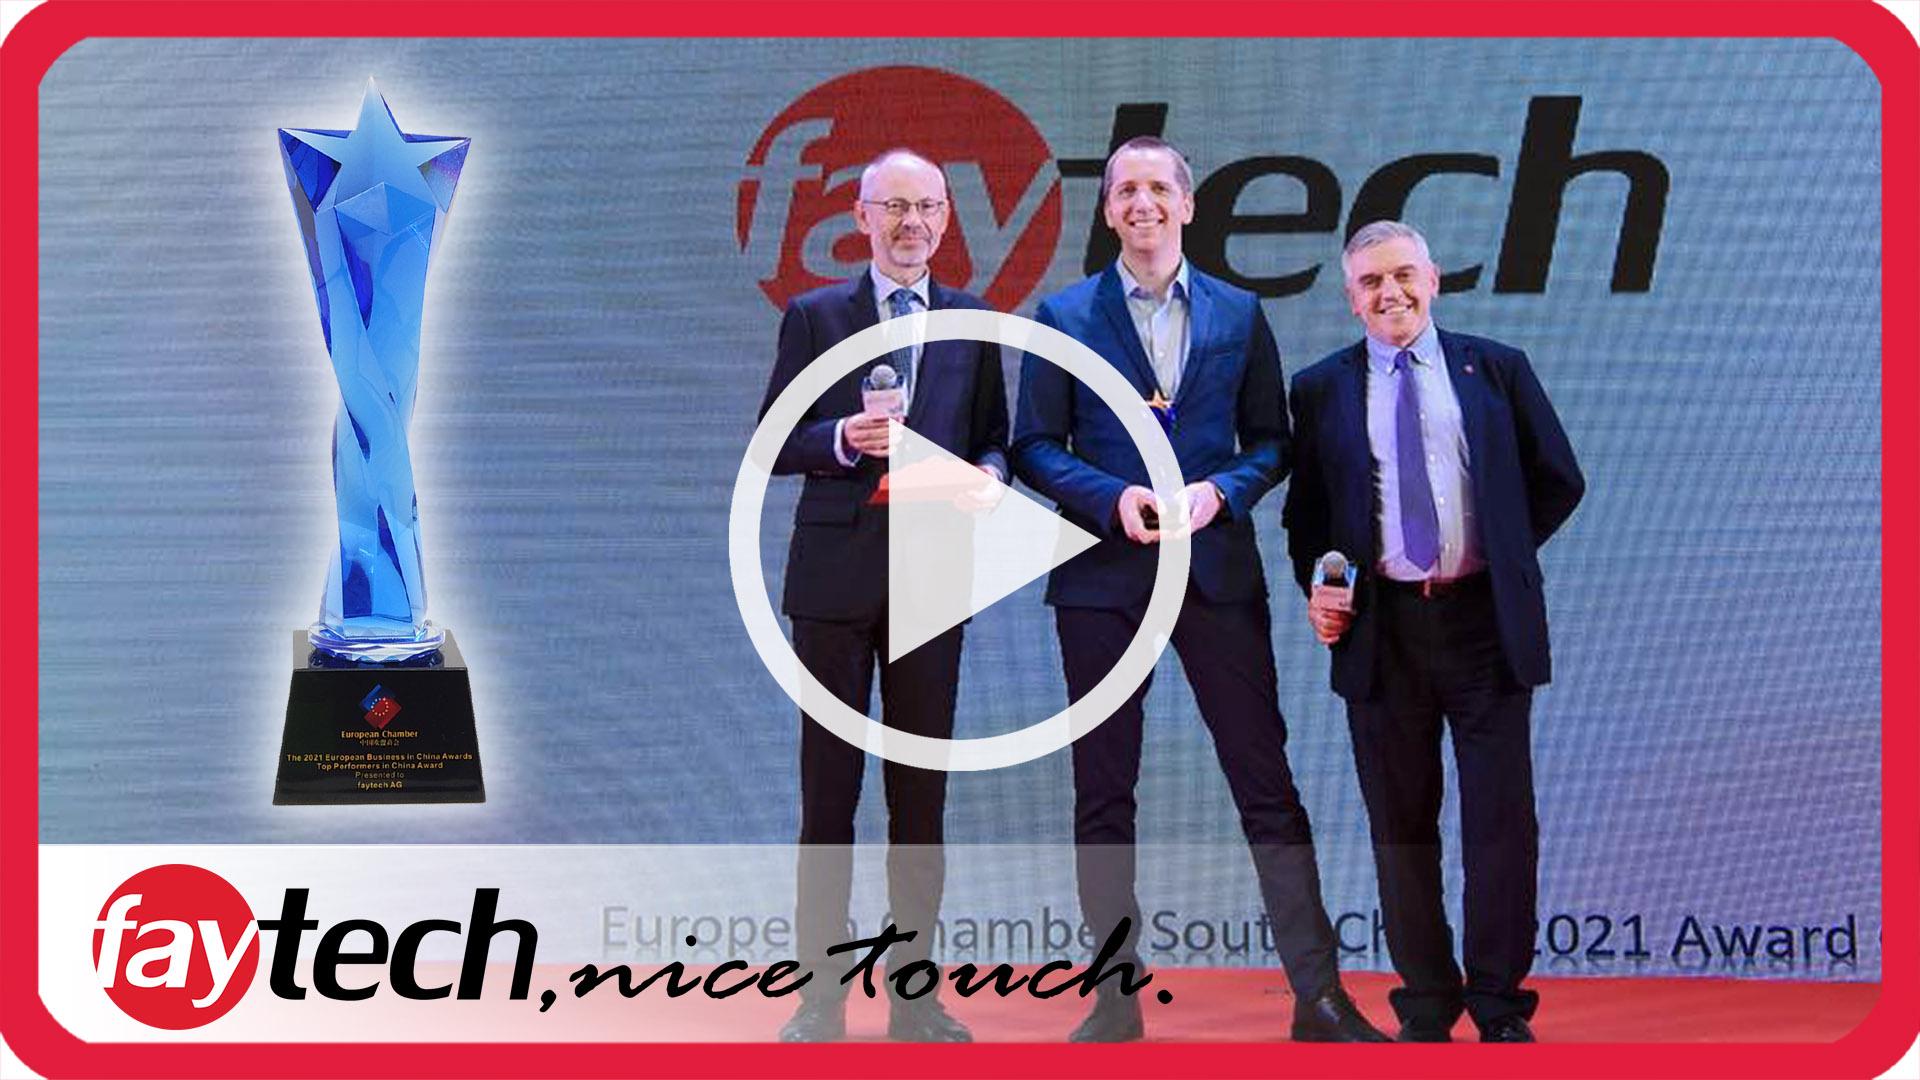 faytech video - Top Performer in China Award